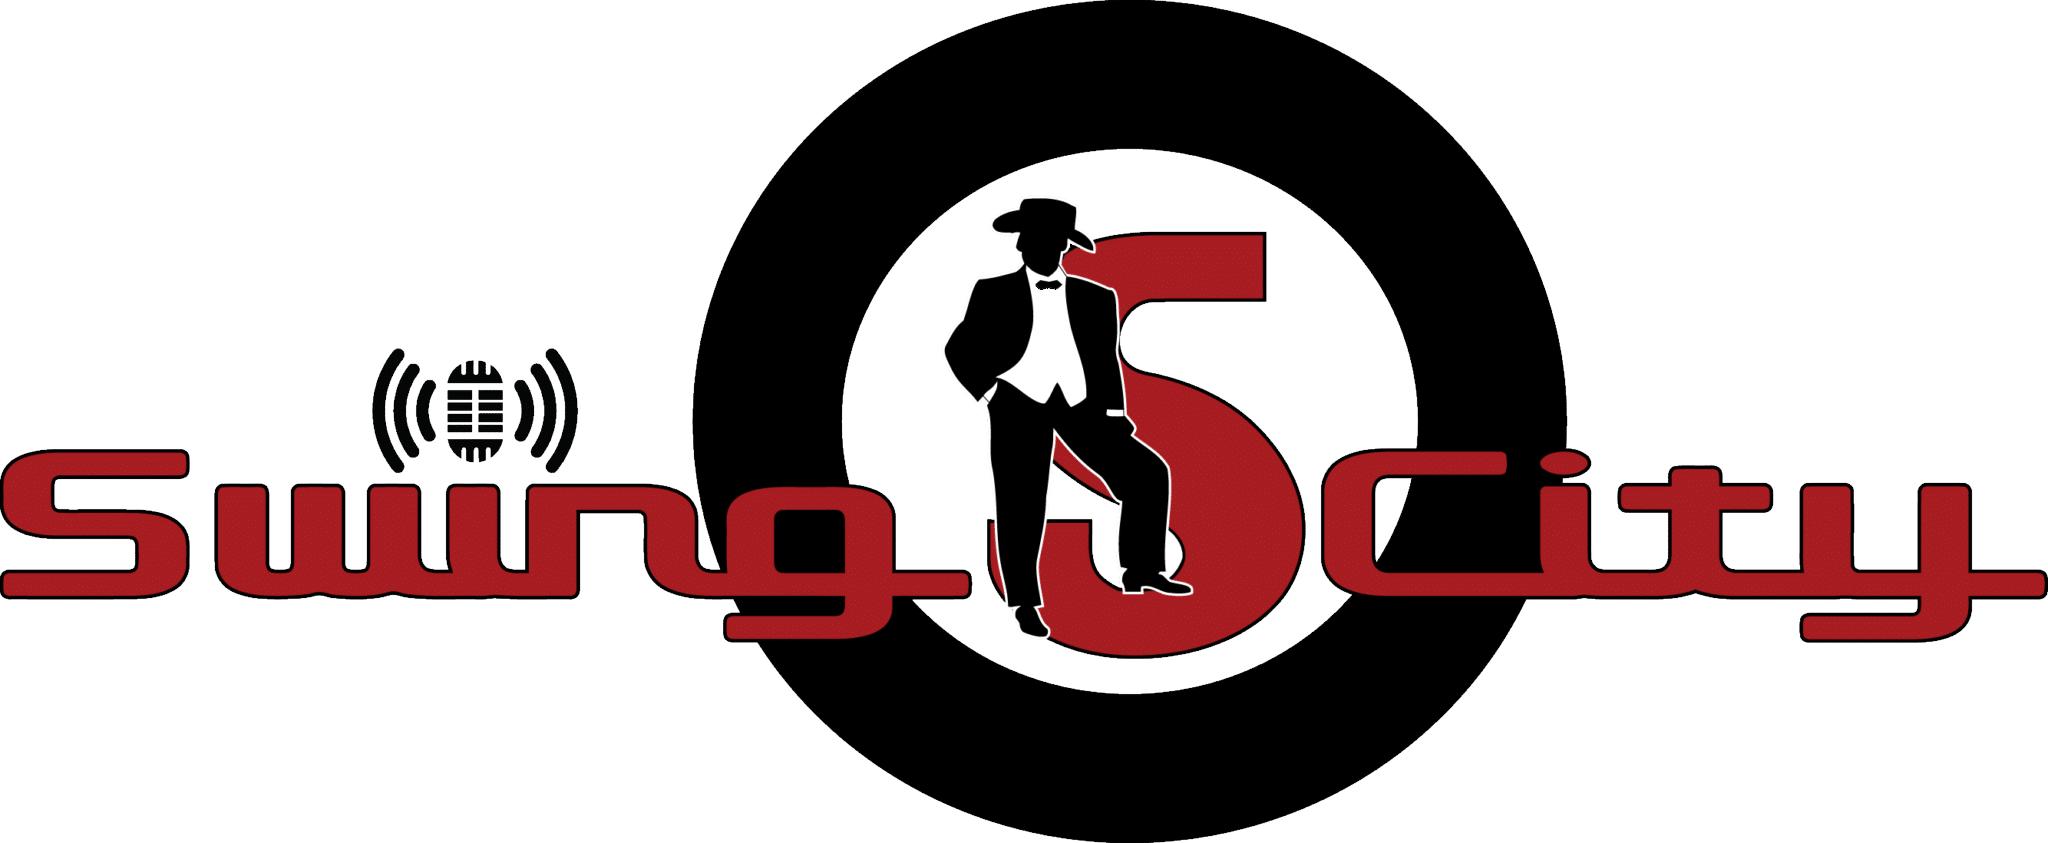 Swing City Auction Company